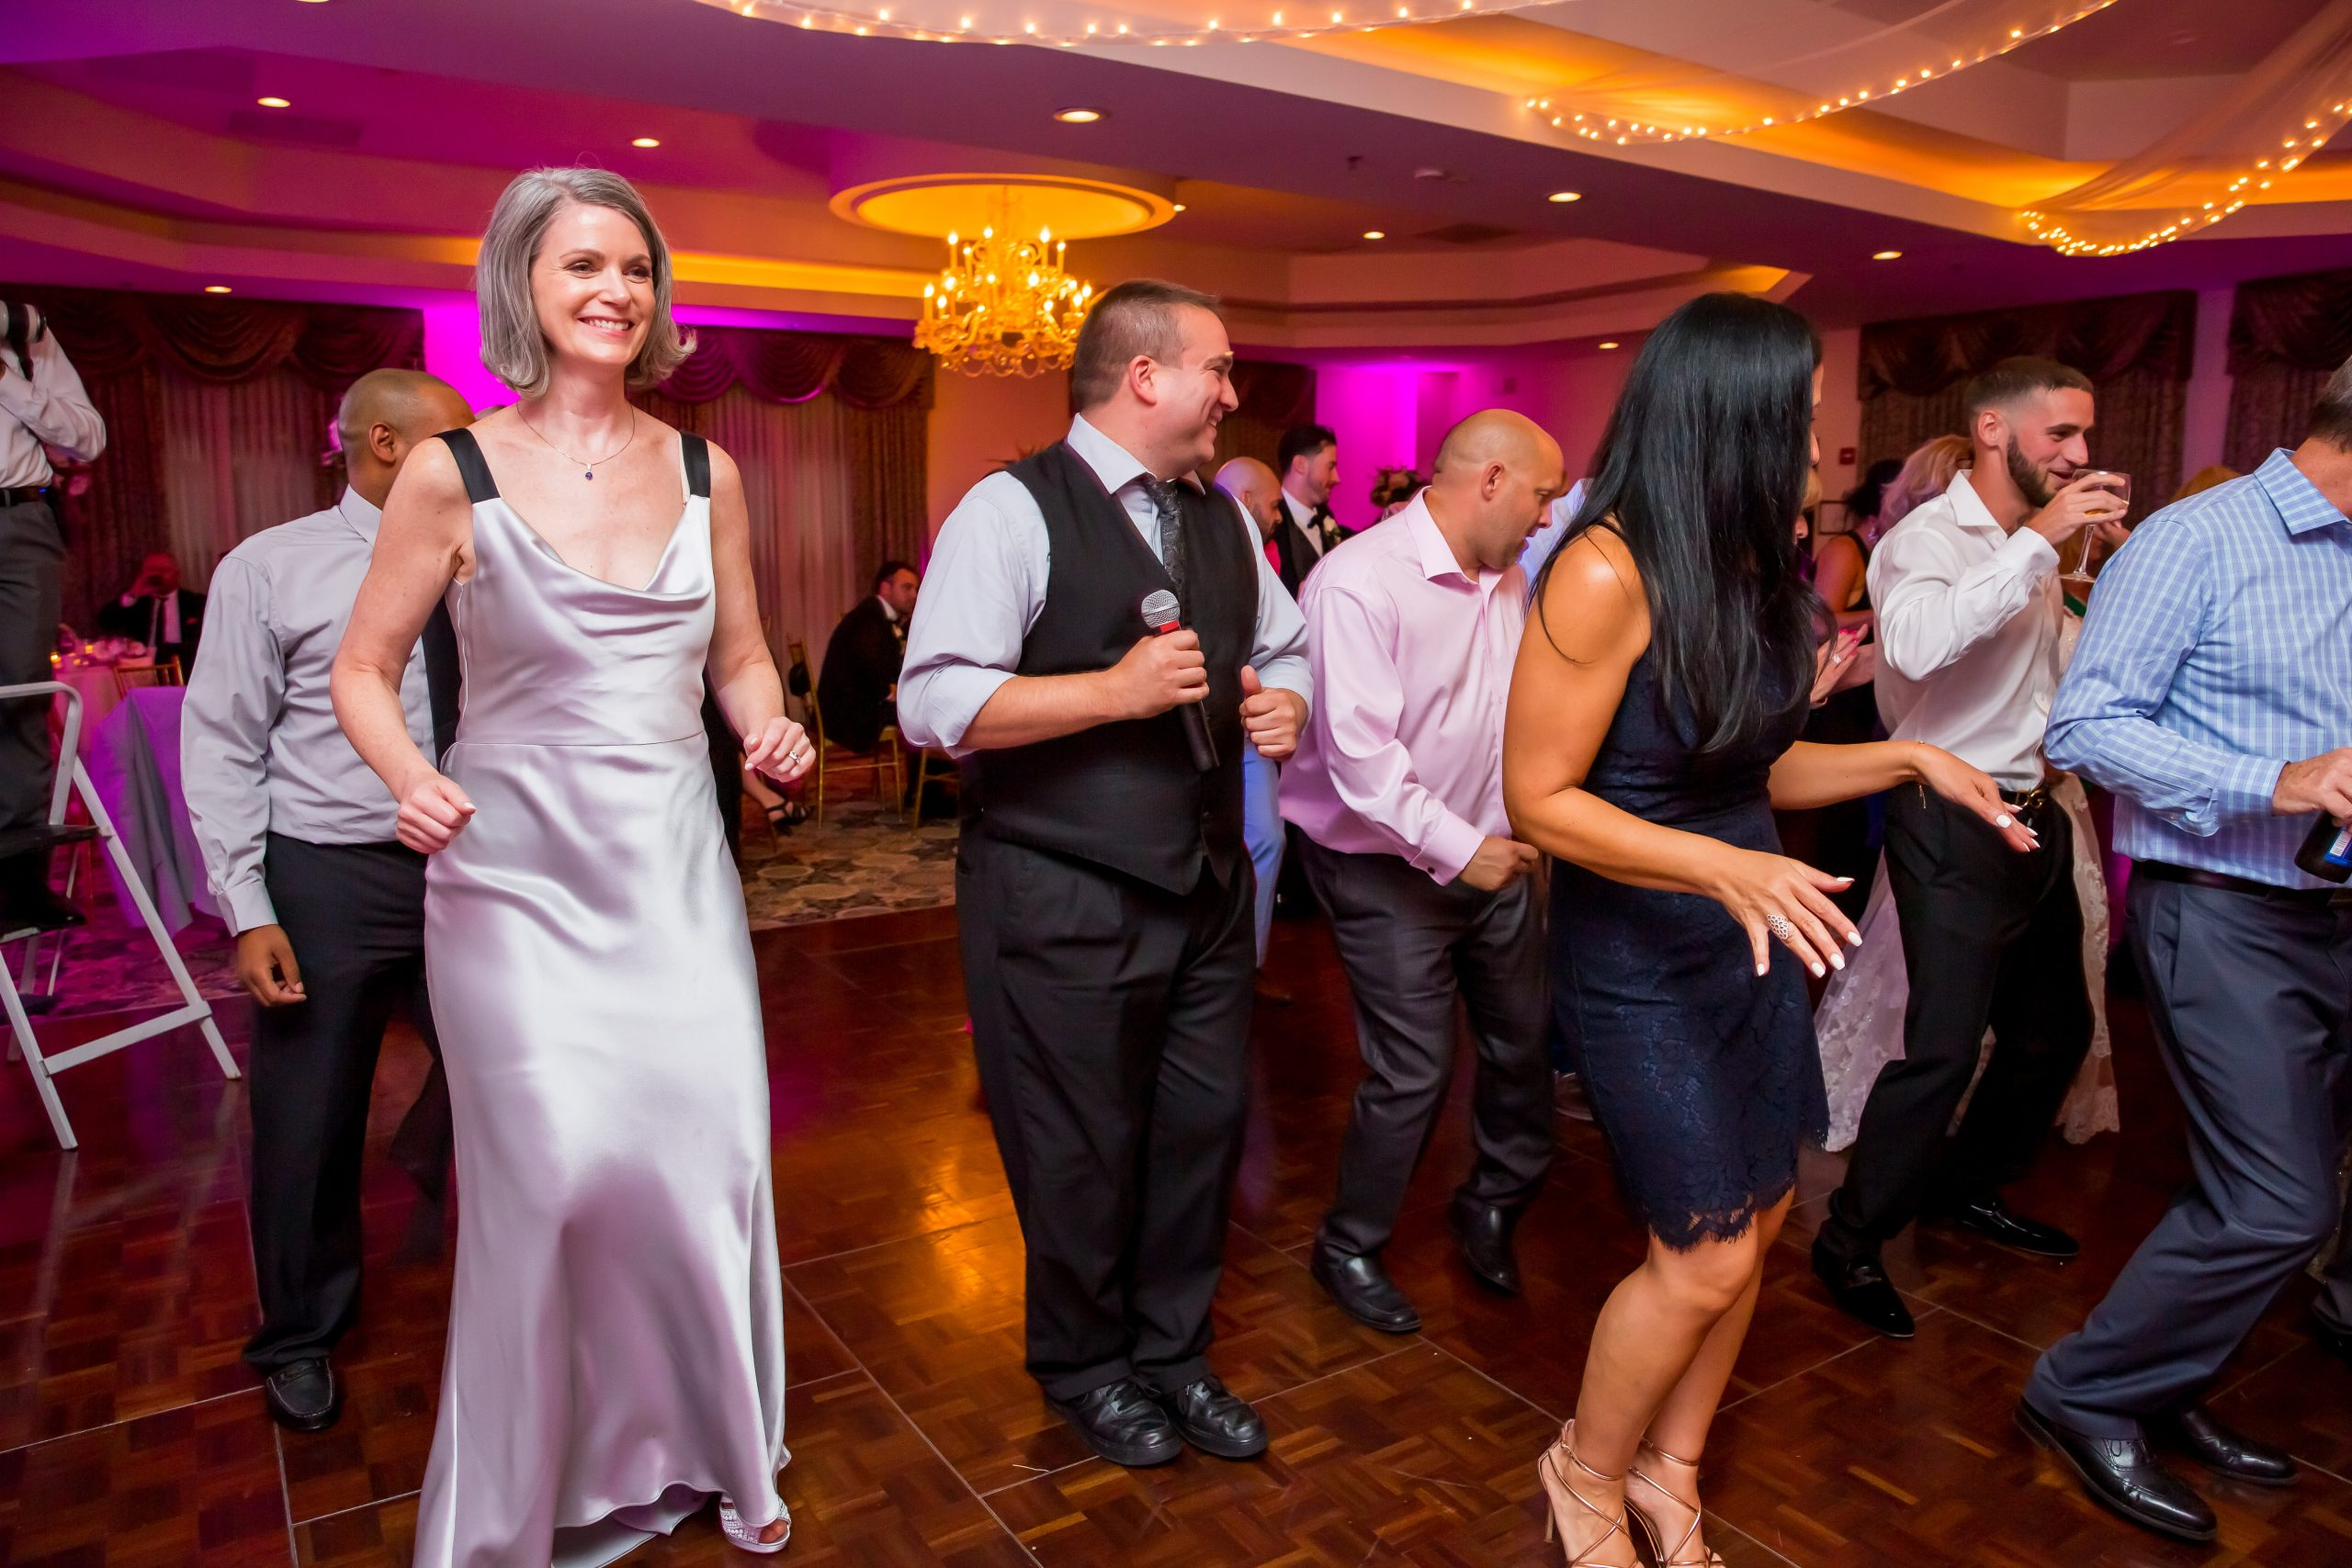 Victori_Rob_Mohawk River Country Club Wedding-63.jpg